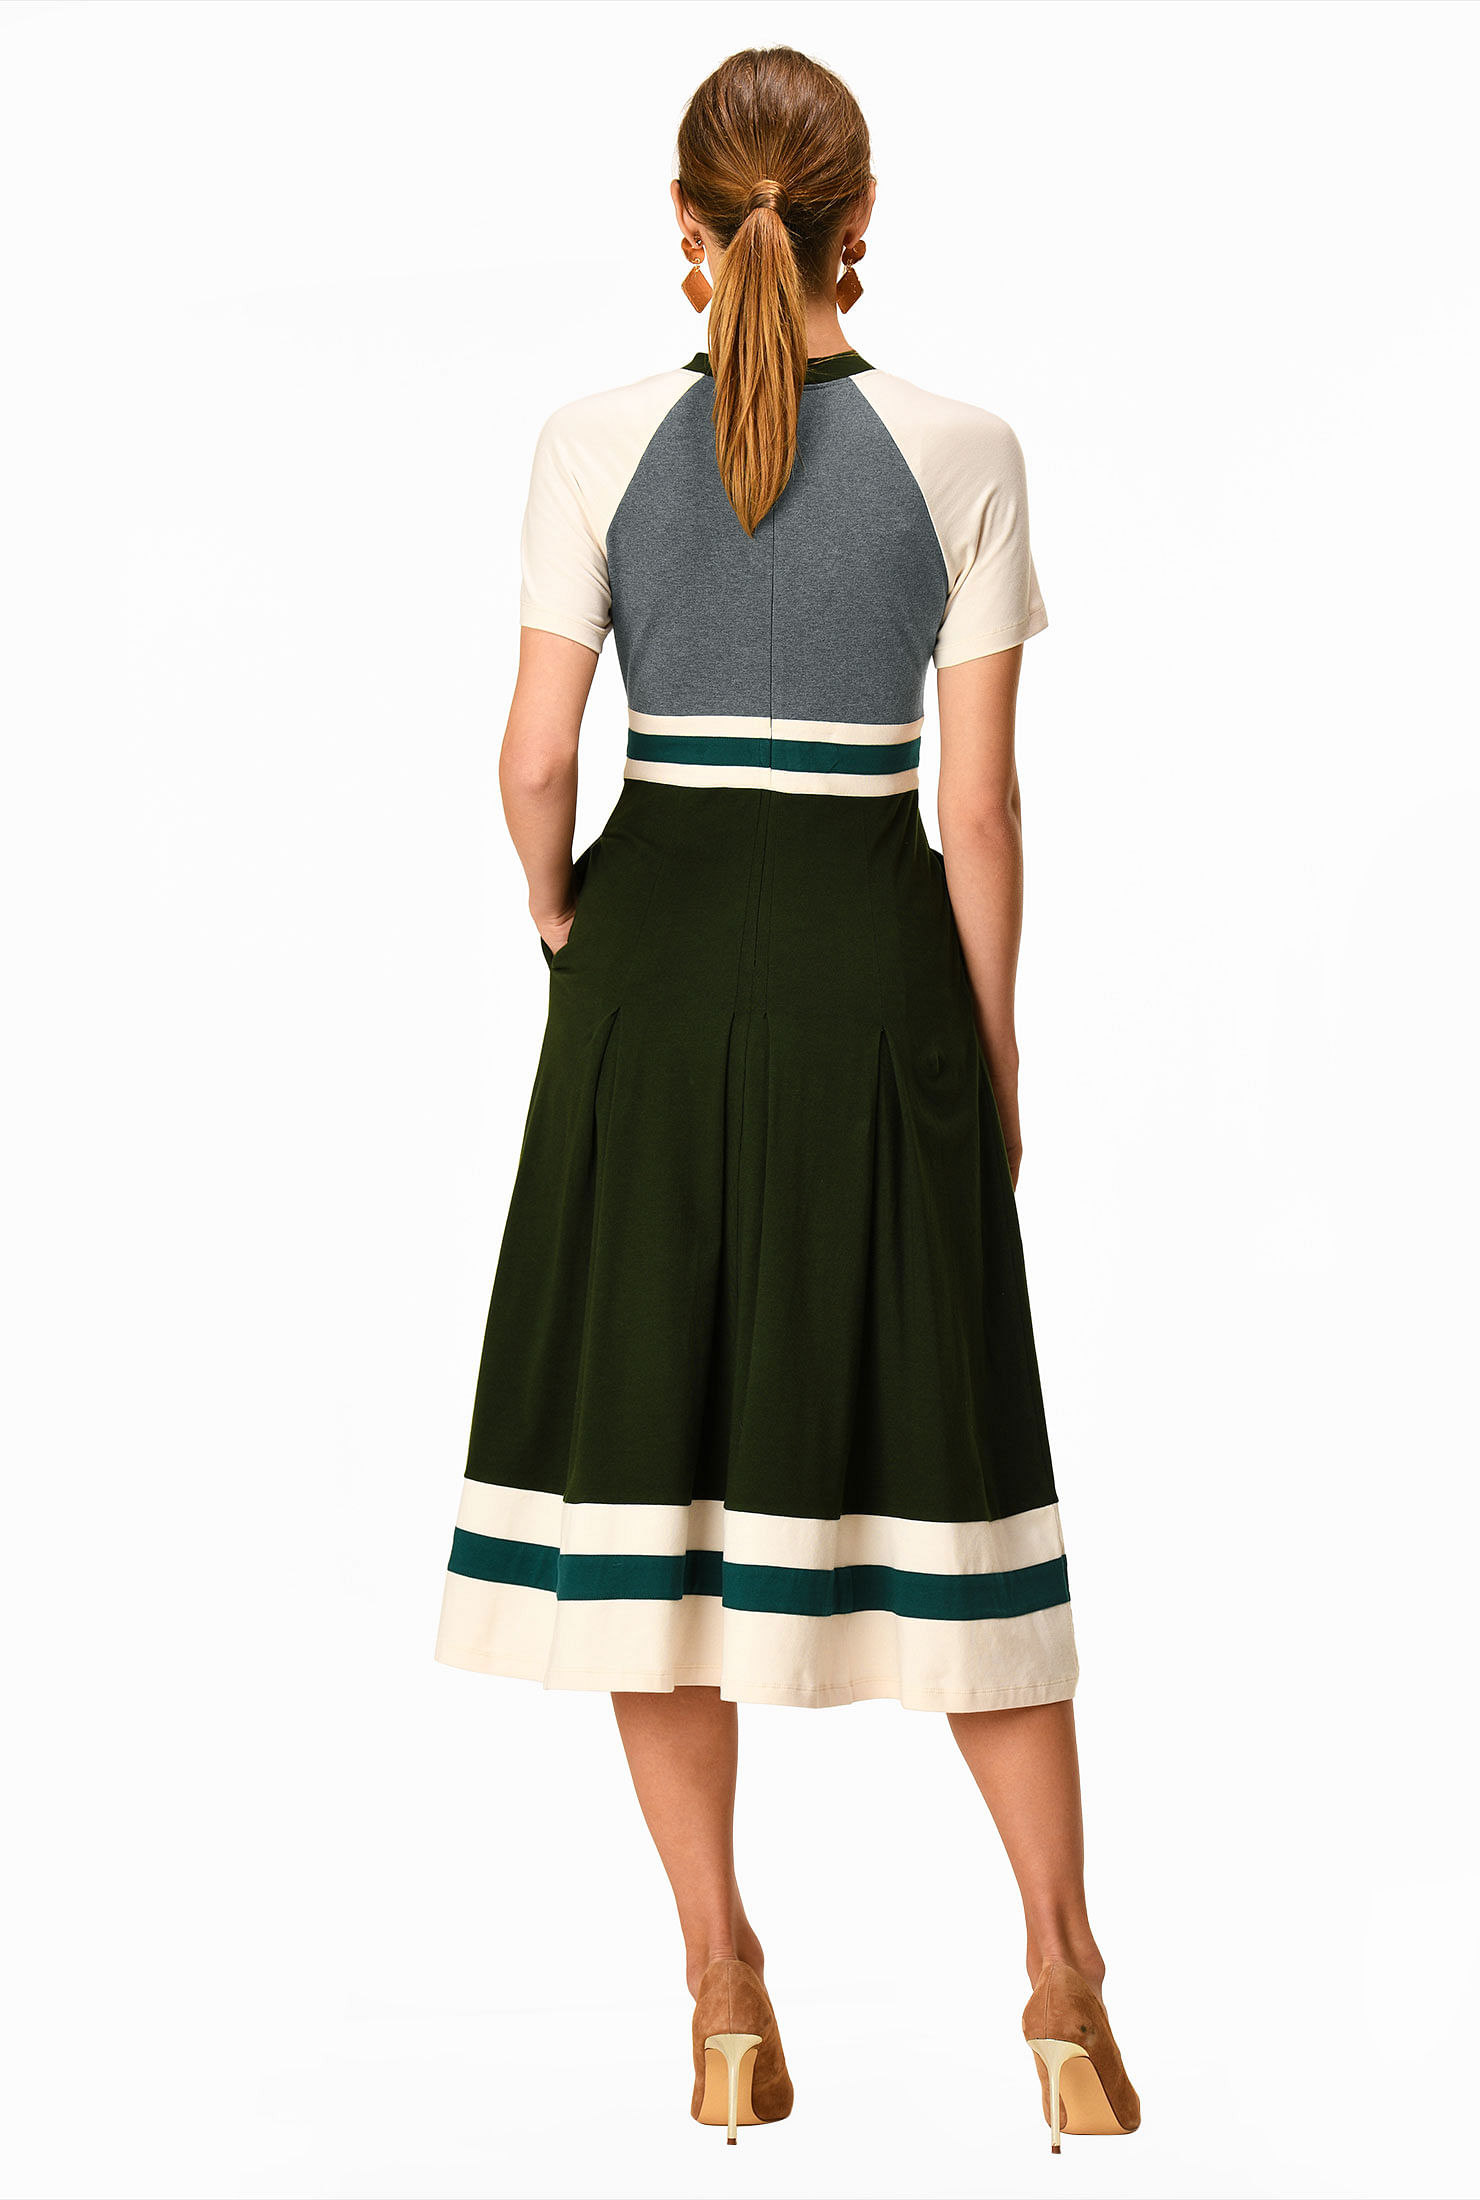 Sleeve Customizable Neckline eShakti FX Banded Stripe Trim Colorblock Cotton Knit Dress